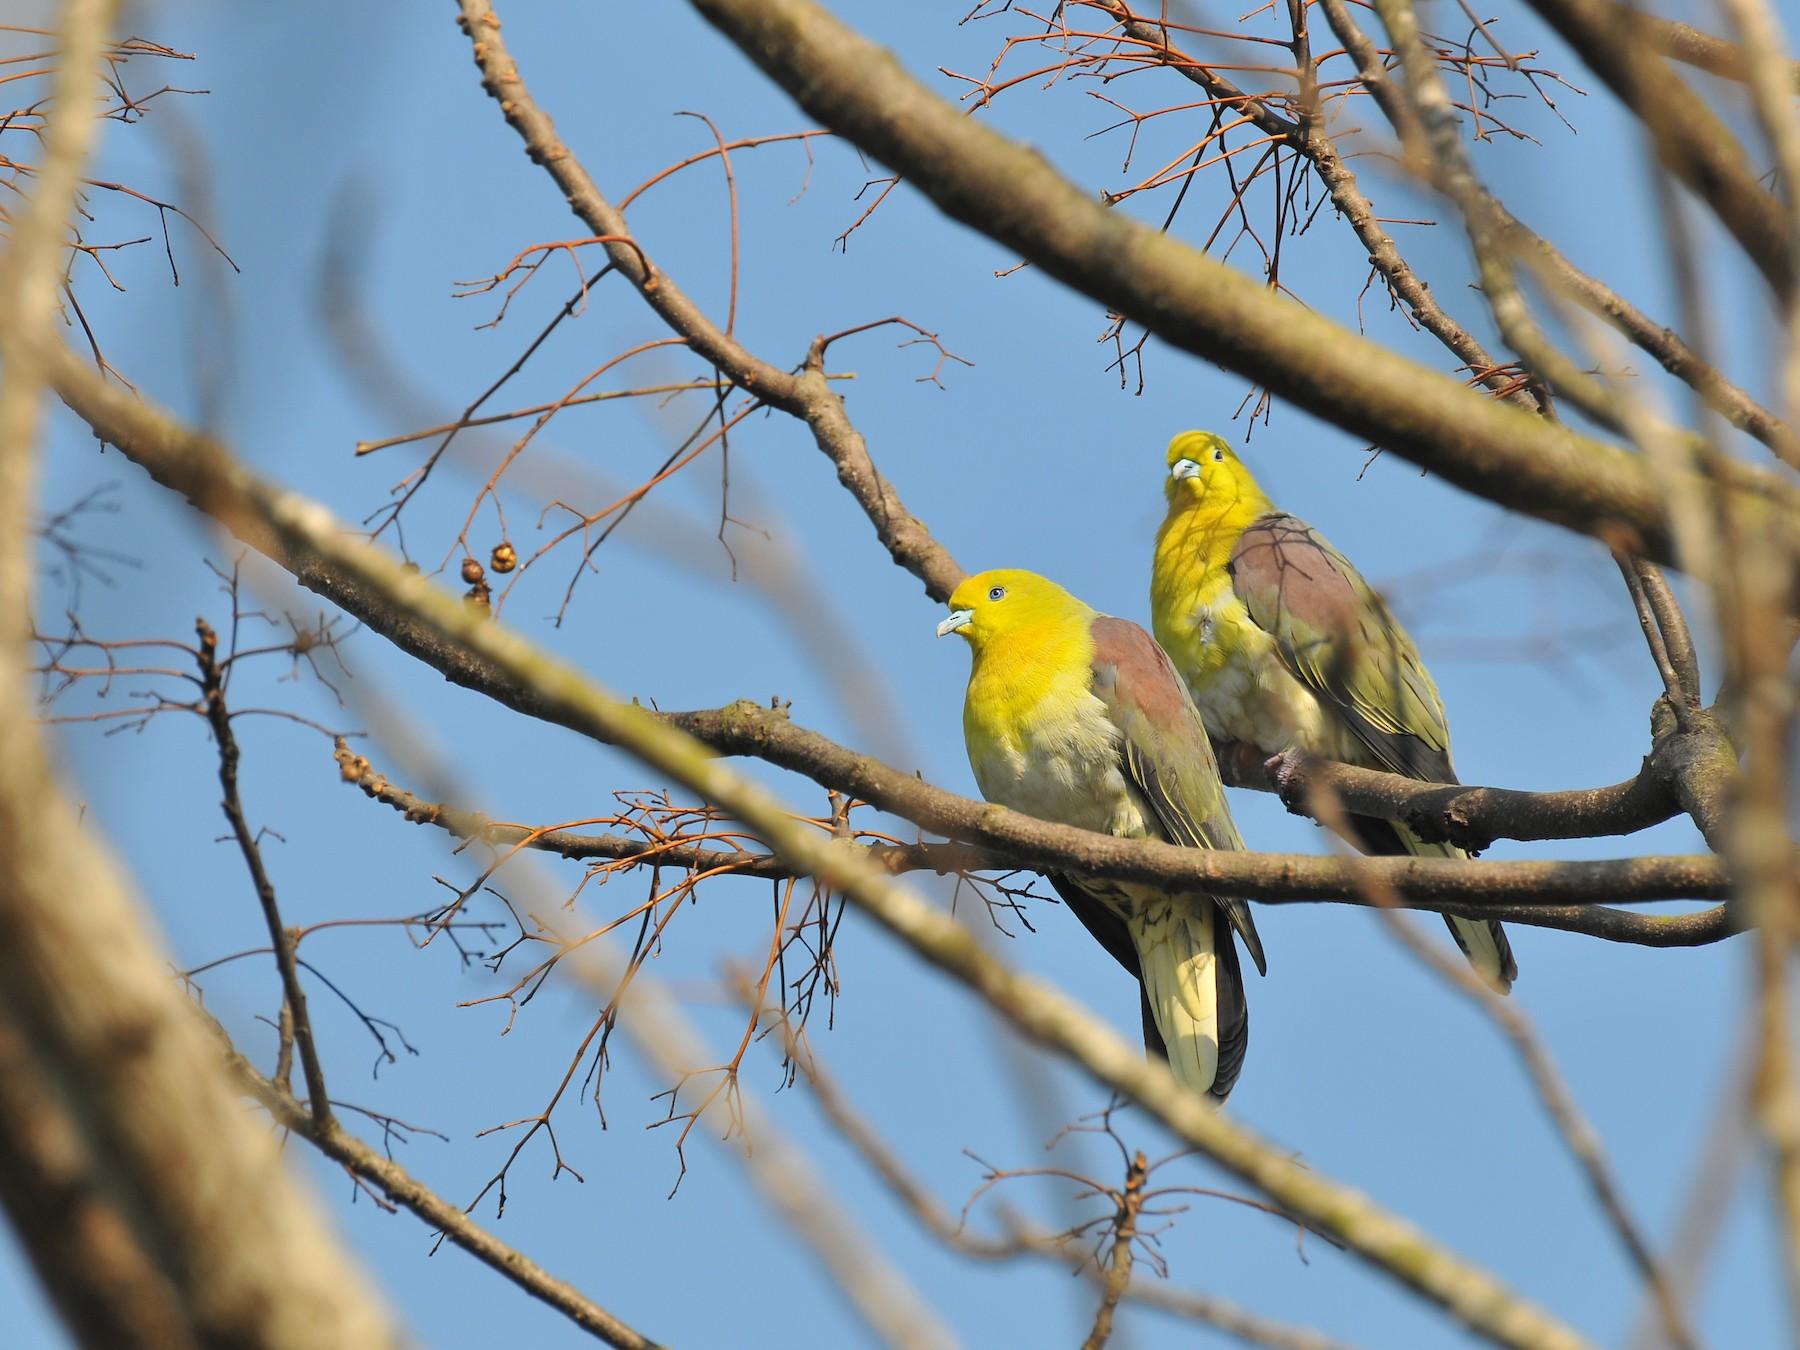 White-bellied Green-Pigeon - Cheng-Ru Tsai